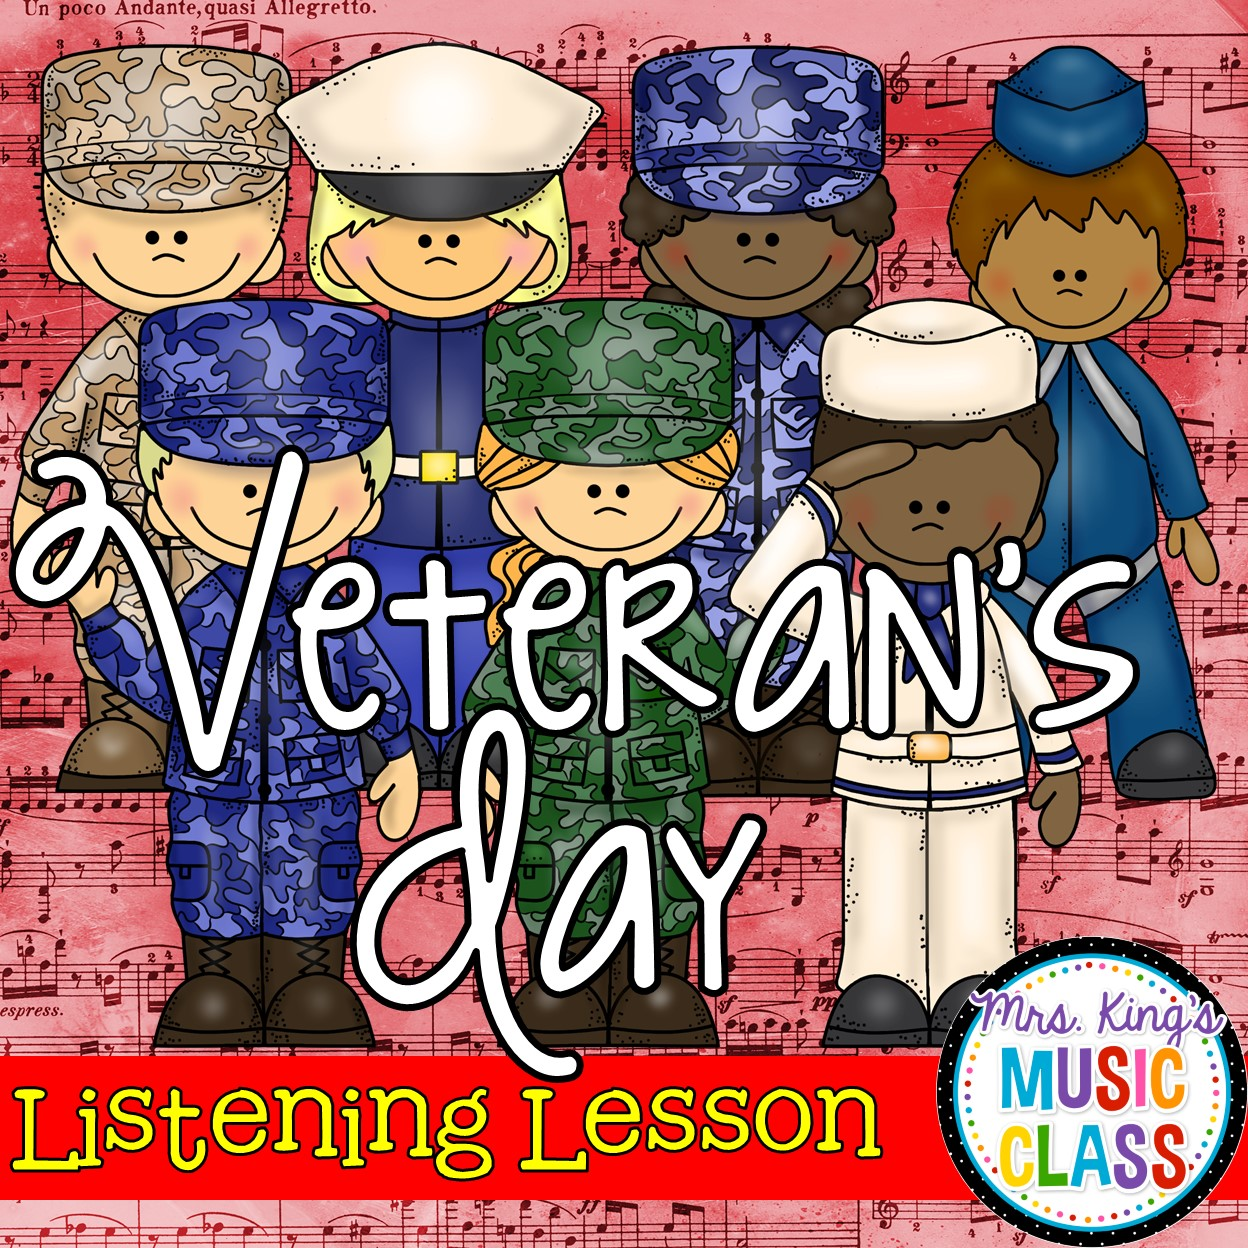 medium resolution of Mrs. King's Music Class: Veteran's Day Listening Lesson